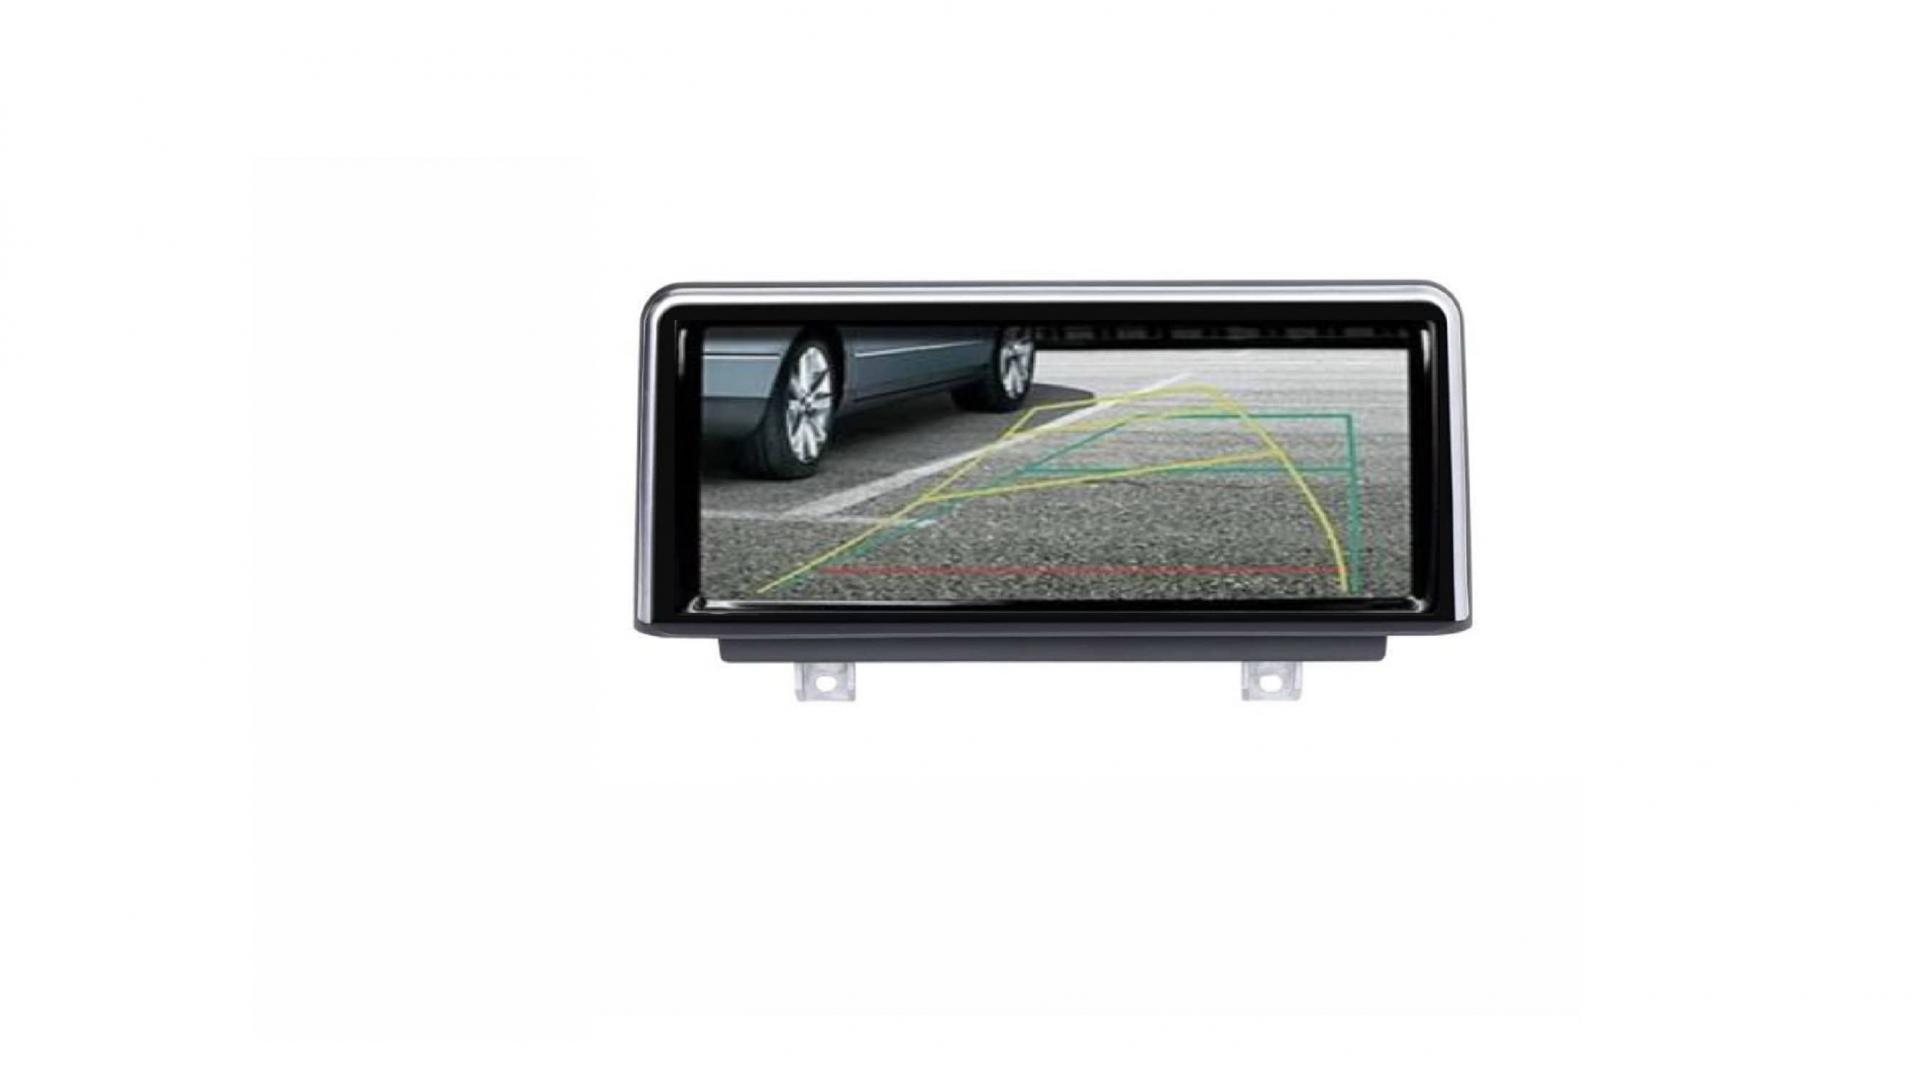 Bmw serie 1 f20 f21 autoradio gps bluetooth android auto carplay camera de recul commande au volant2